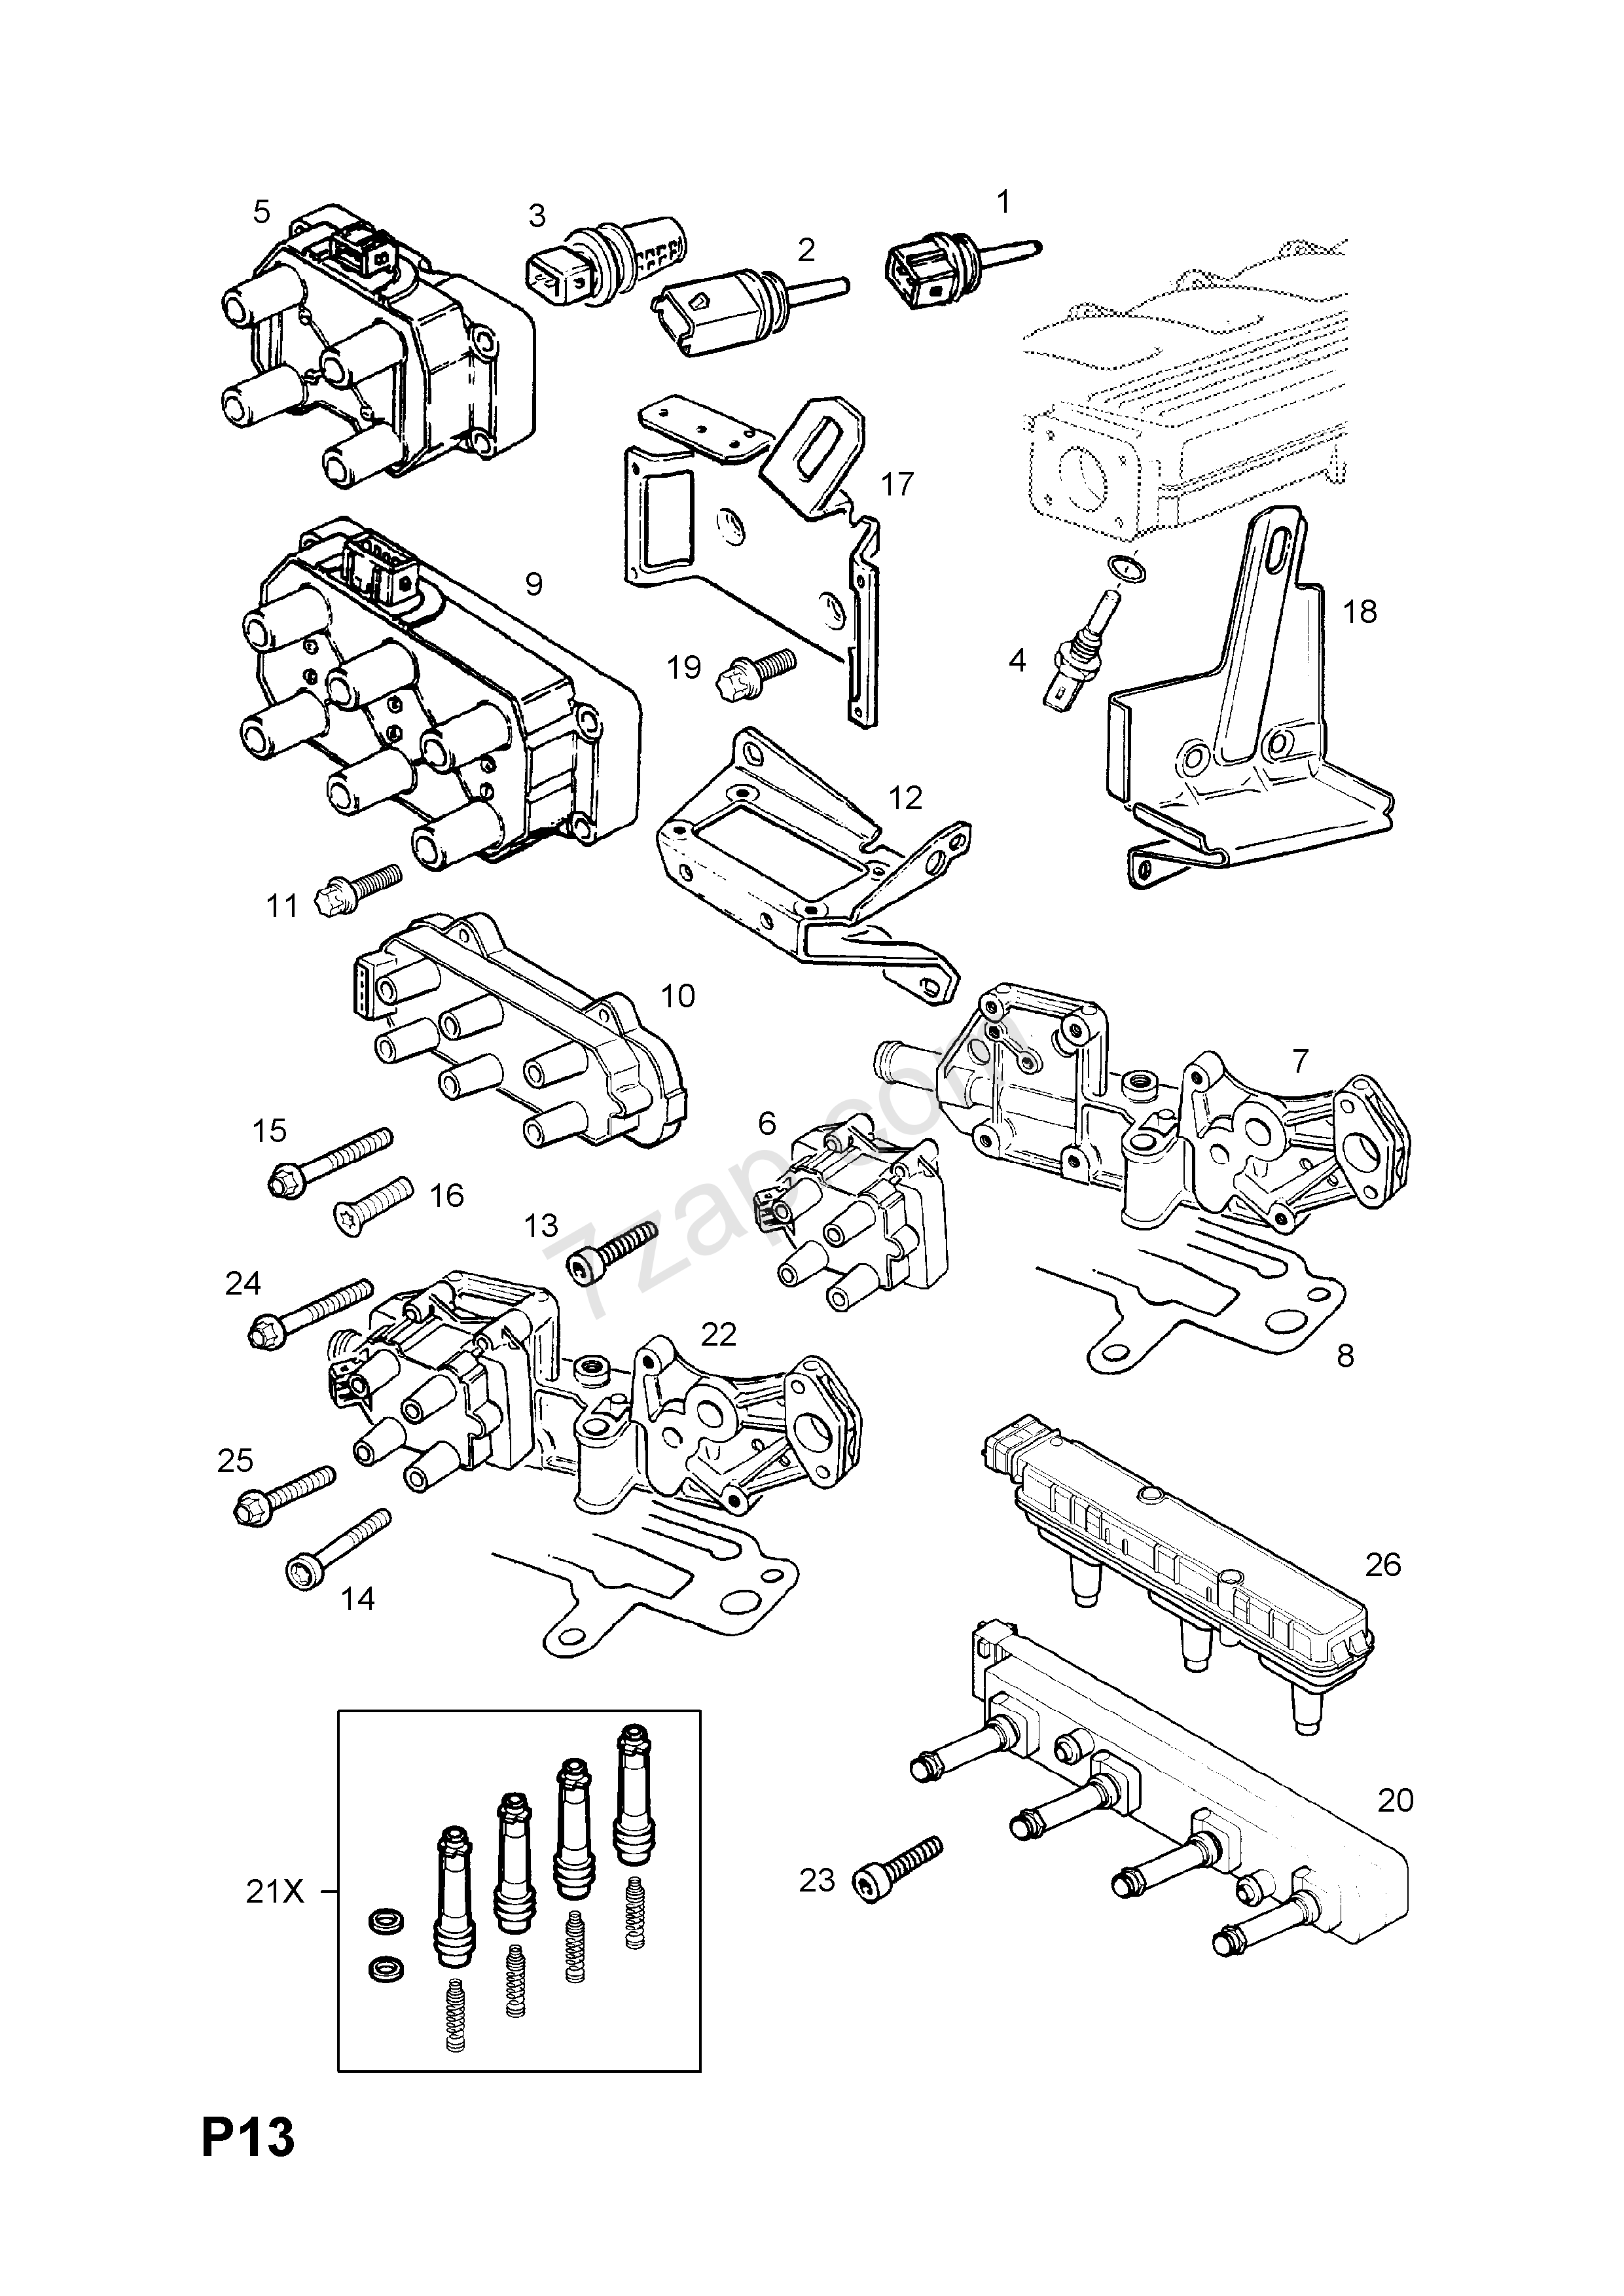 New Basic Engine Wiring #diagram #wiringdiagram #diagramming ... on westinghouse wiring diagrams, kitchenaid wiring diagrams, maytag wiring diagrams, gibson wiring diagrams, ge wiring diagrams, sears wiring diagrams, hotpoint wiring diagrams, frigidaire wiring diagrams, eaton wiring diagrams, craftsman wiring diagrams, whirlpool wiring diagrams, samsung wiring diagrams, hobart wiring diagrams, lg wiring diagrams, panasonic wiring diagrams, viking wiring diagrams, dacor wiring diagrams, speed queen wiring diagrams, amana wiring diagrams, buckley wiring diagrams,